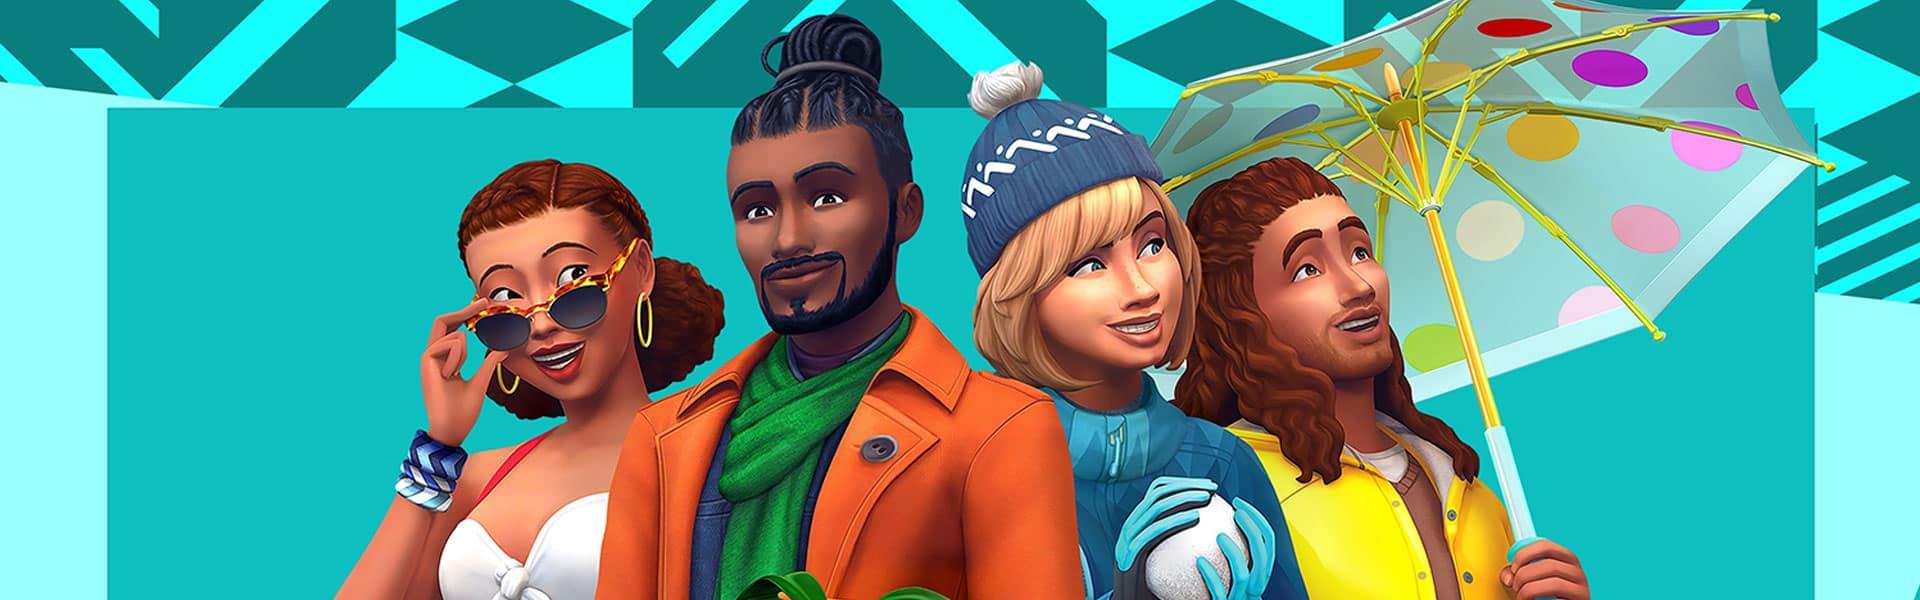 Sims 4 Aspiration Cheat | Sims 4 Aspiration Points Cheat